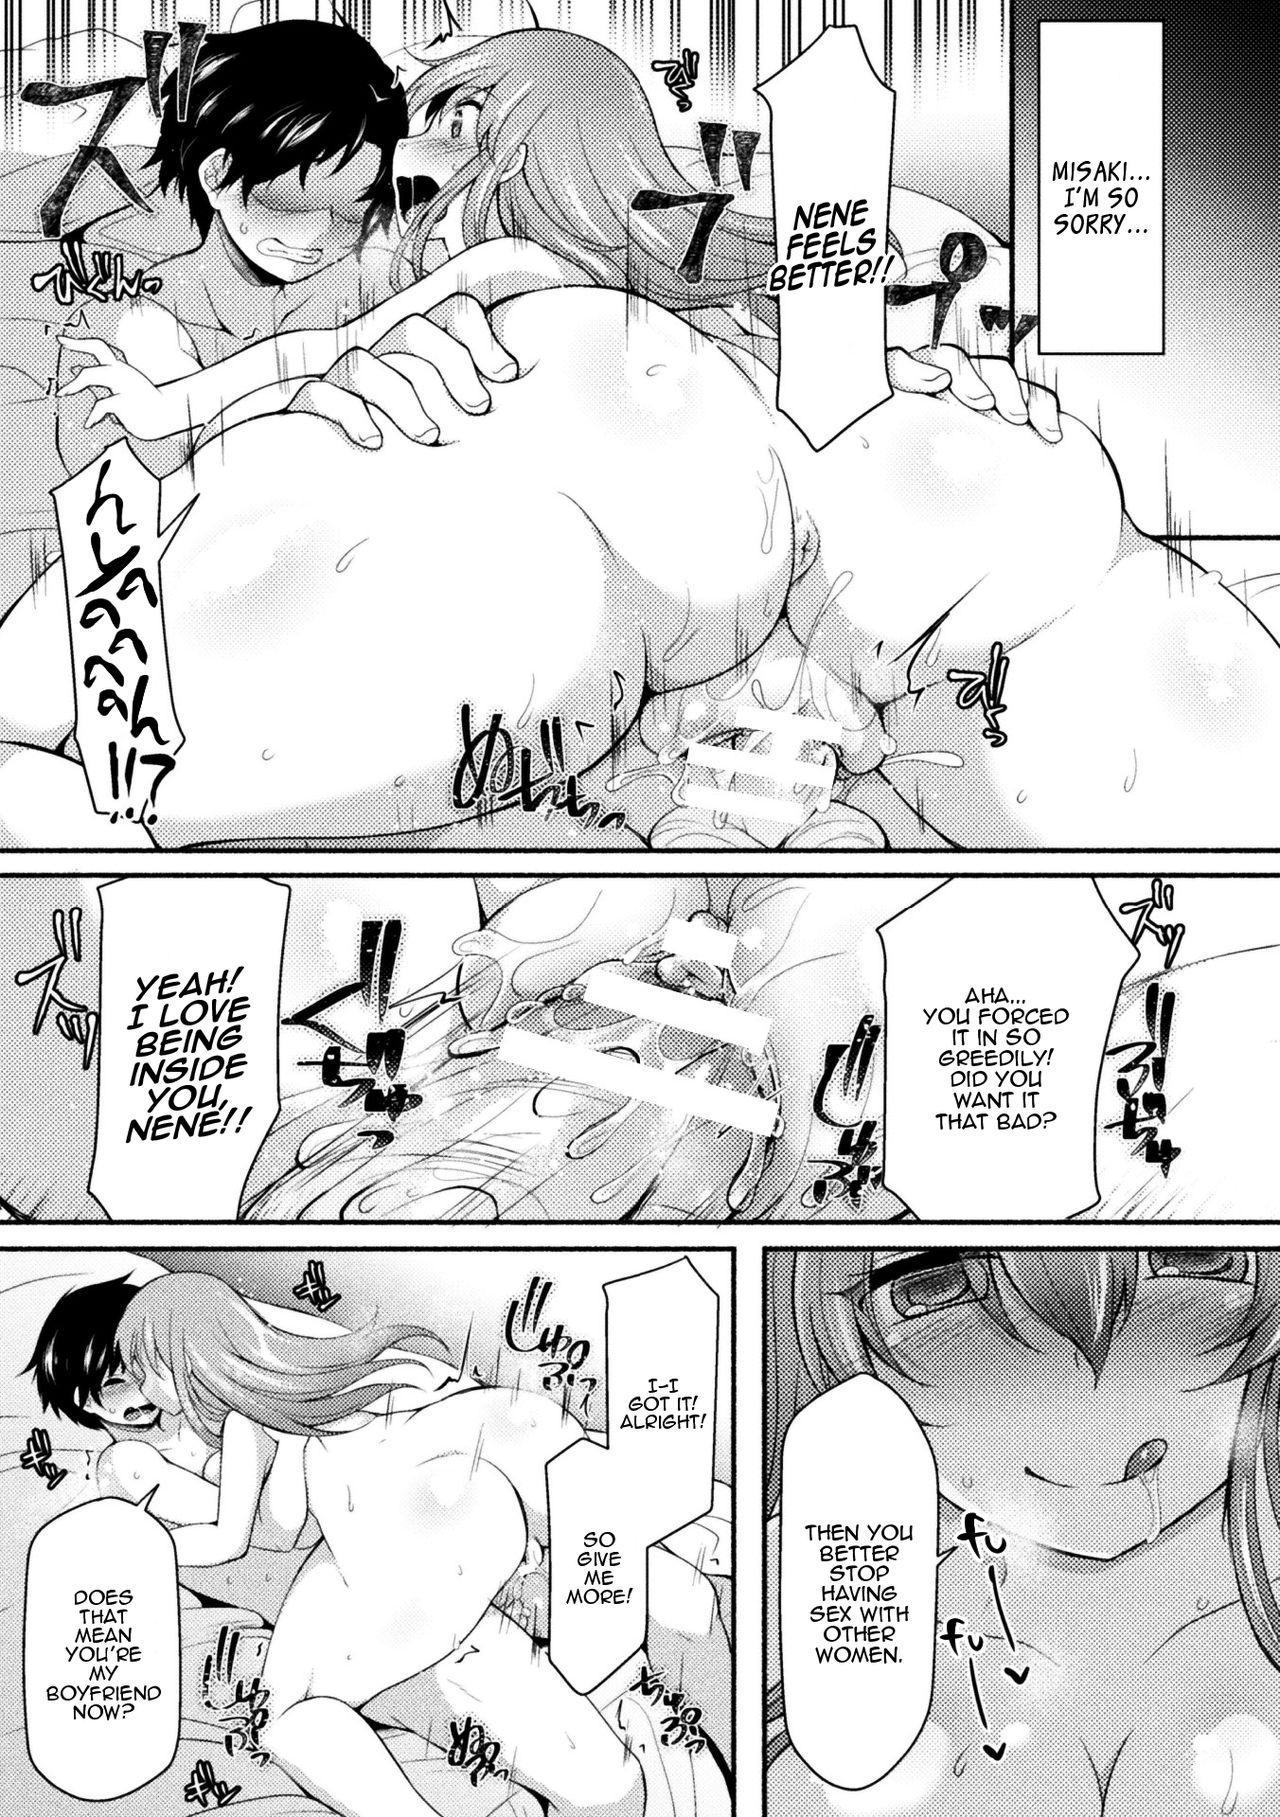 [Jenigata] NTRiage ~Ai o Chikau... Hazu deshita~   NTRiage ~An Oath of Love, or Really?~ [English] [Panatical] [Digital] 26